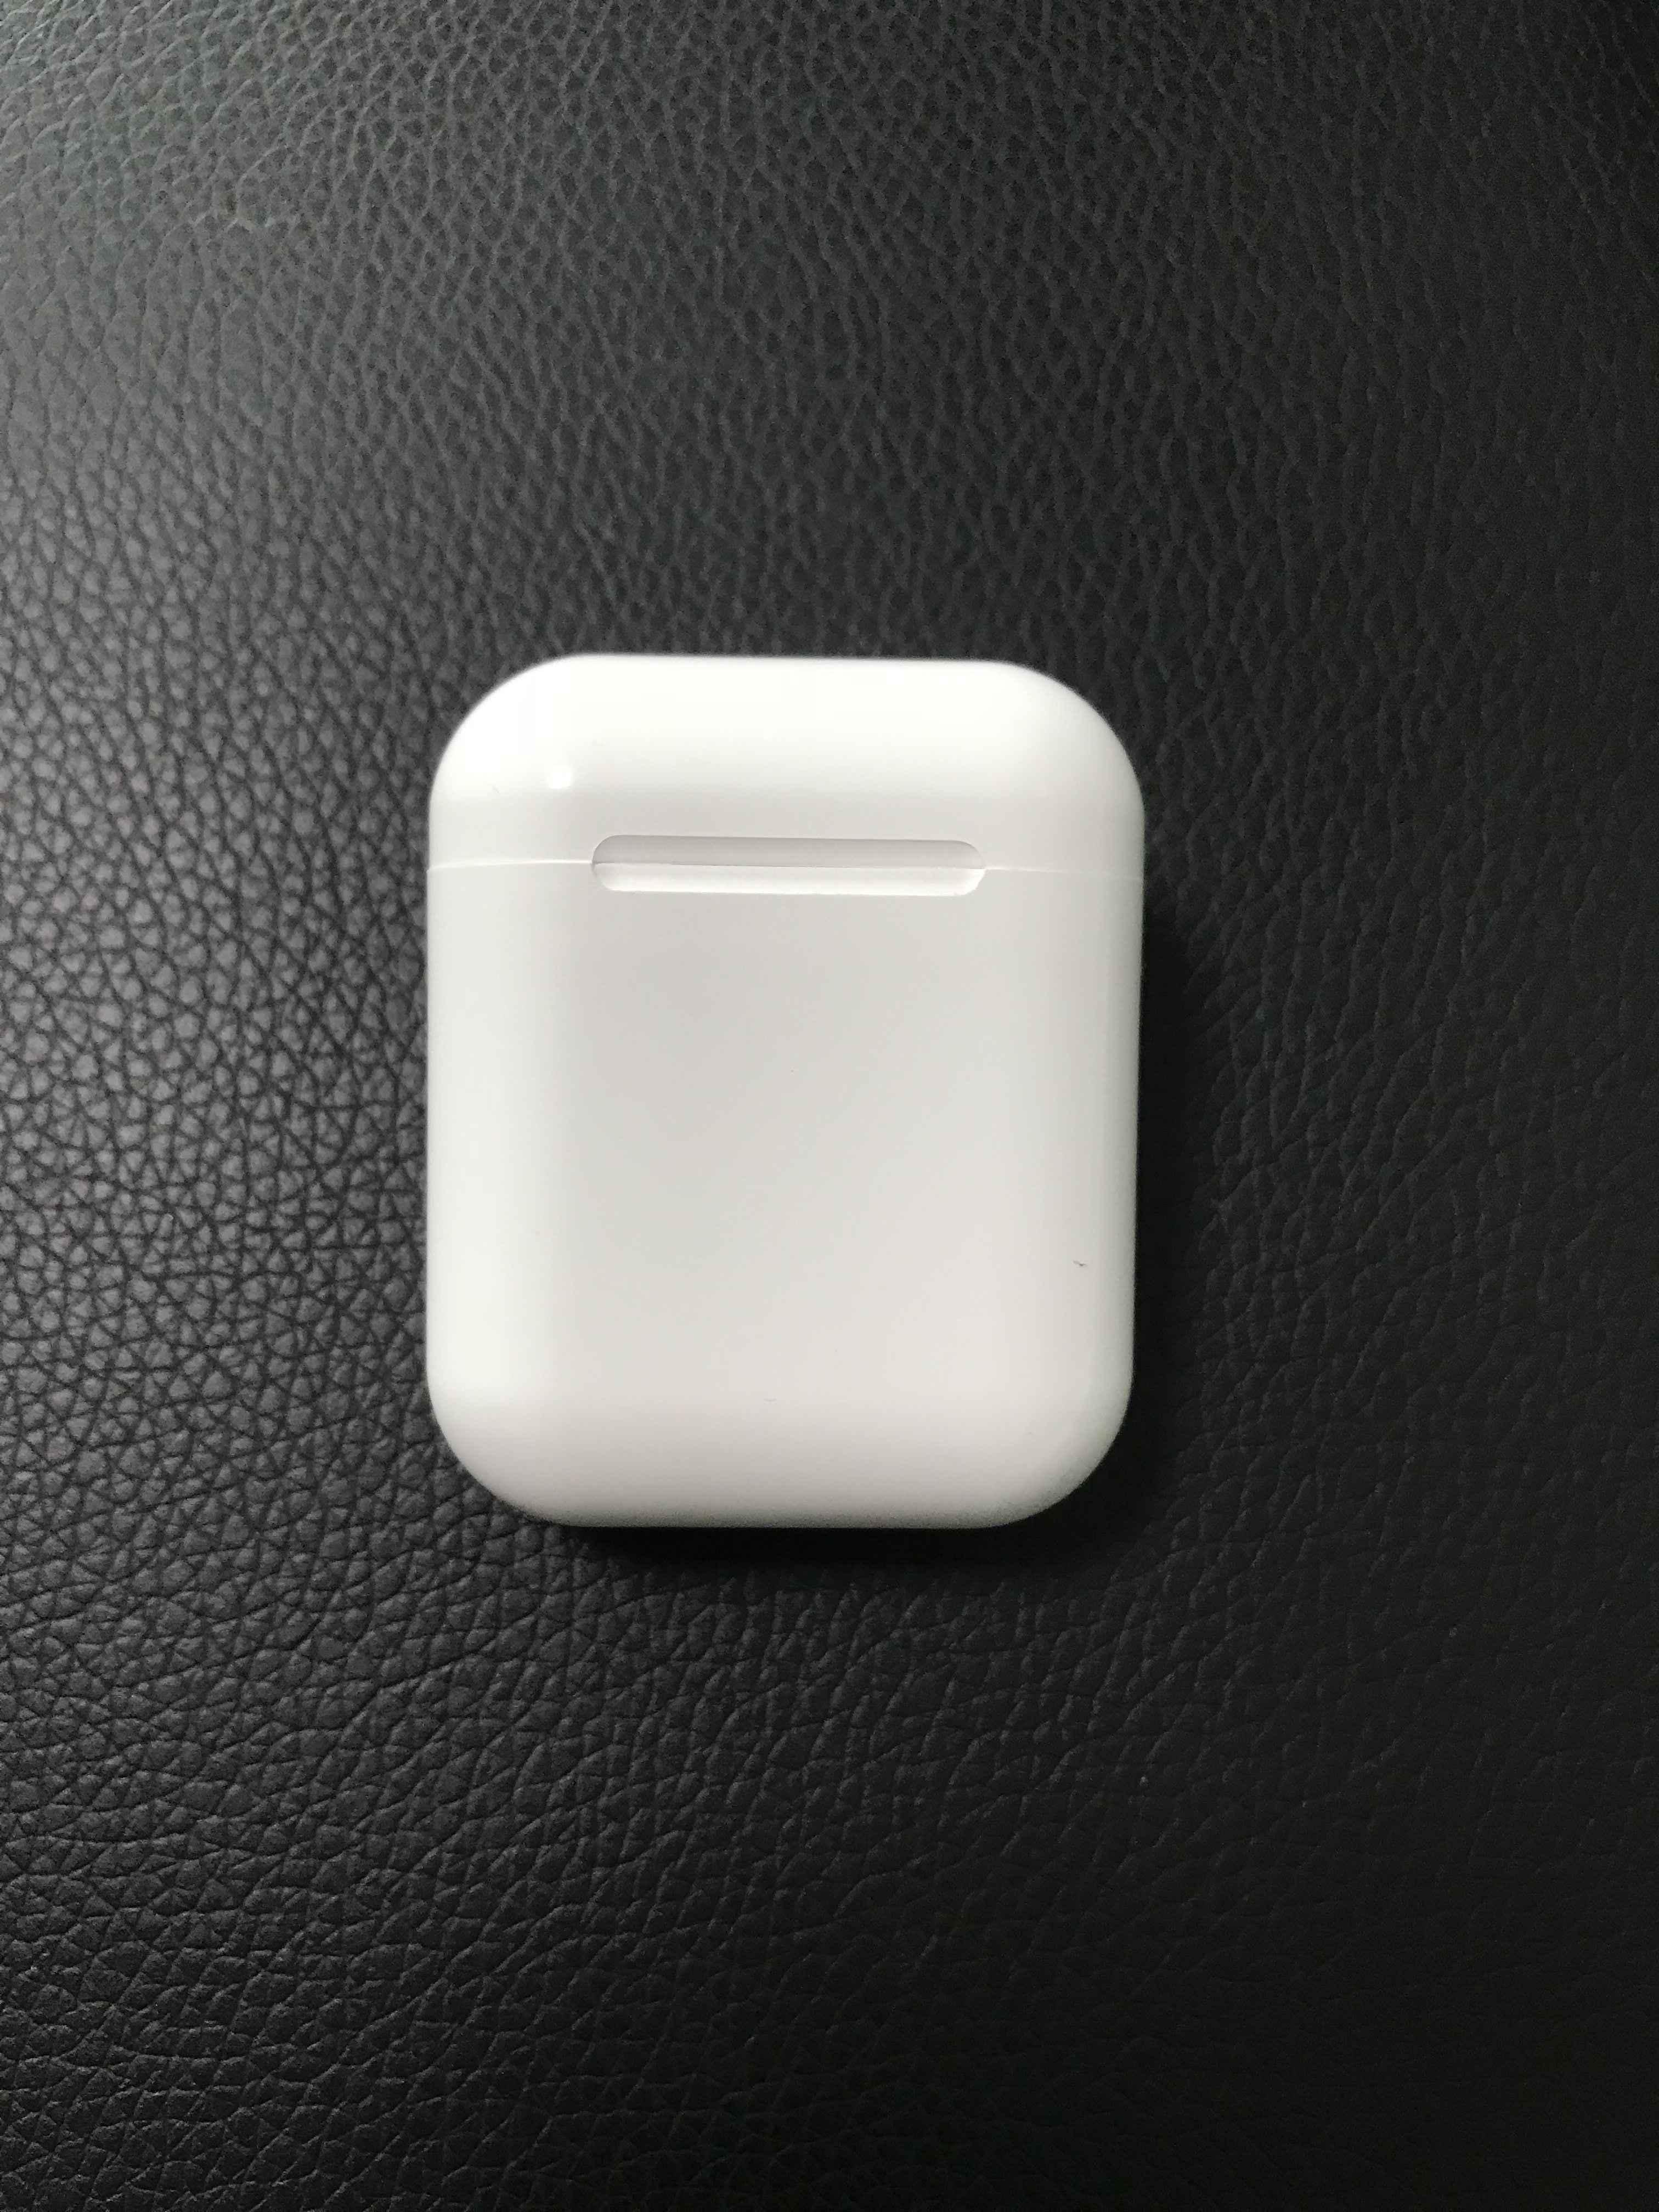 i80 TWS Earphone i100 tws Touch Control + Wireless Charge Bluetooth 5.0 headset PK w1 chip i10 i20 i30 i90 i500